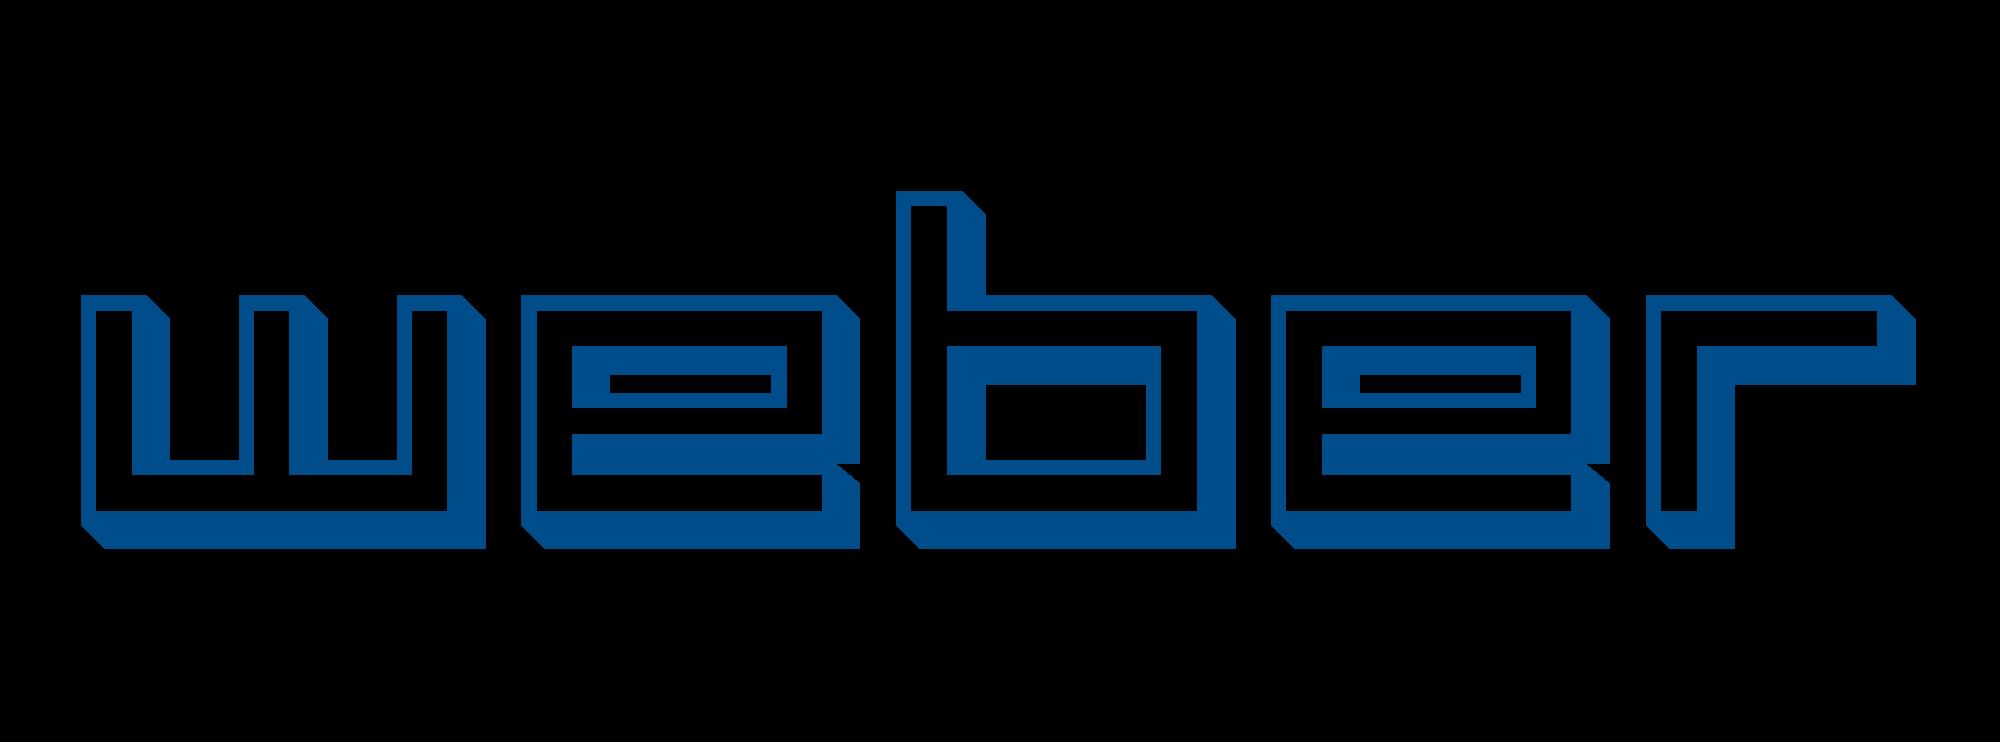 Employee Experience Platform Staffbase Customer Weber Maschinenbau GmbH